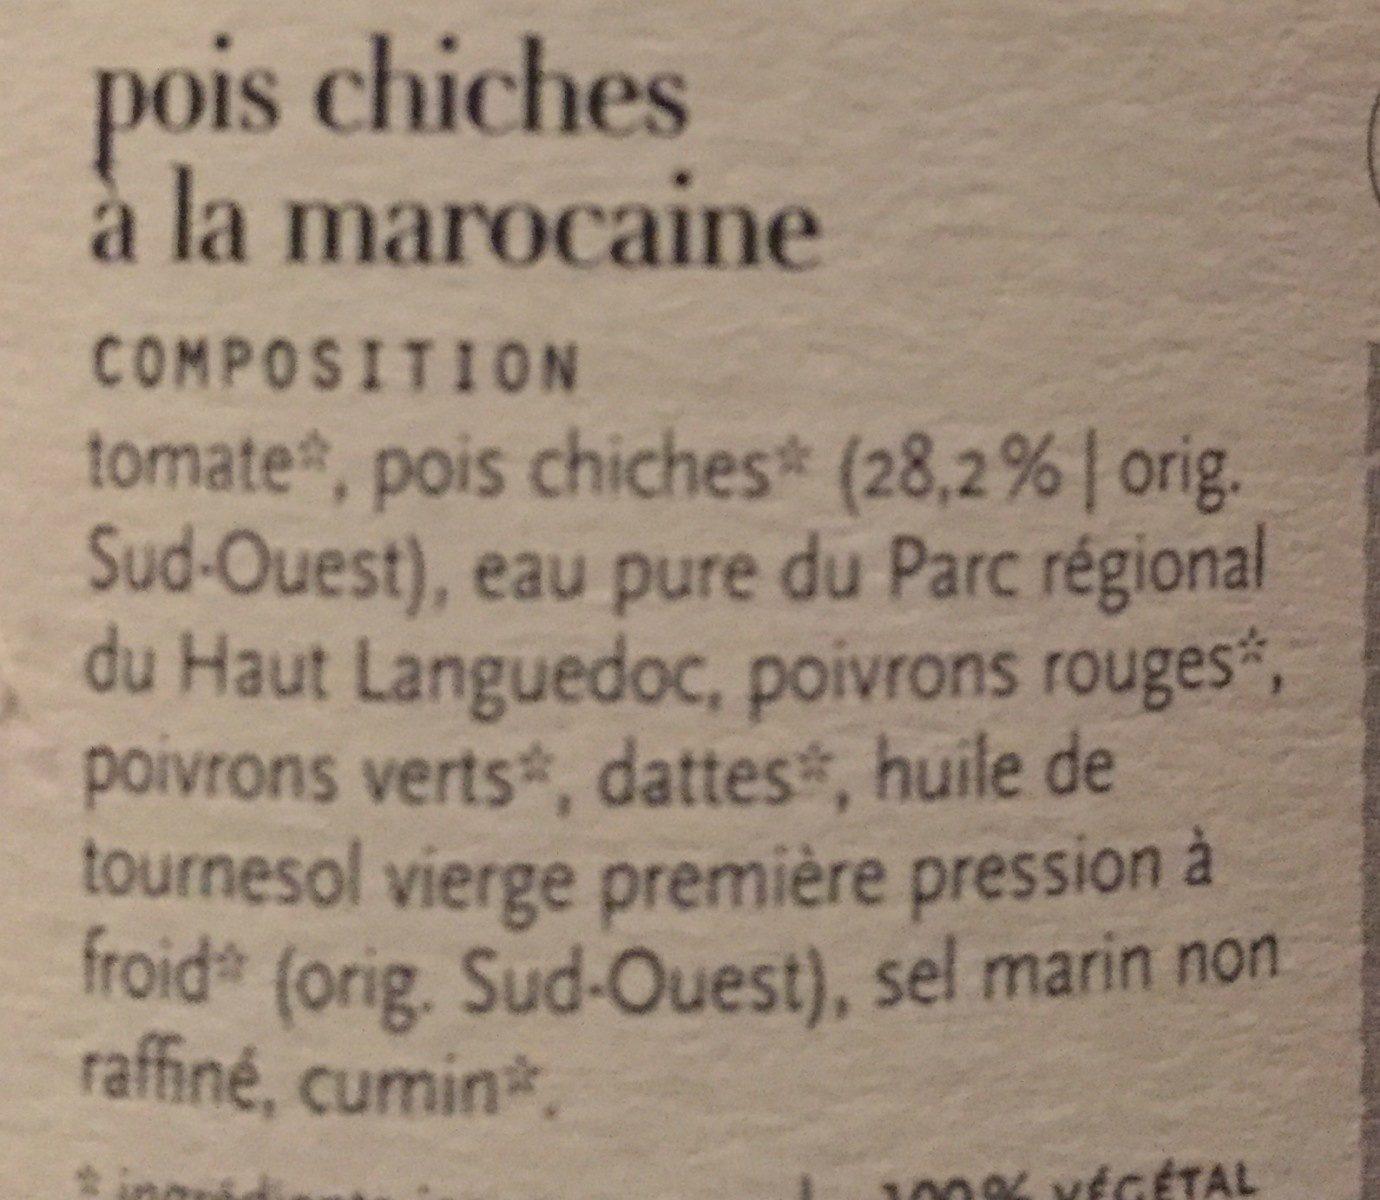 Pois chiches à la marocaine - Ingredienti - fr